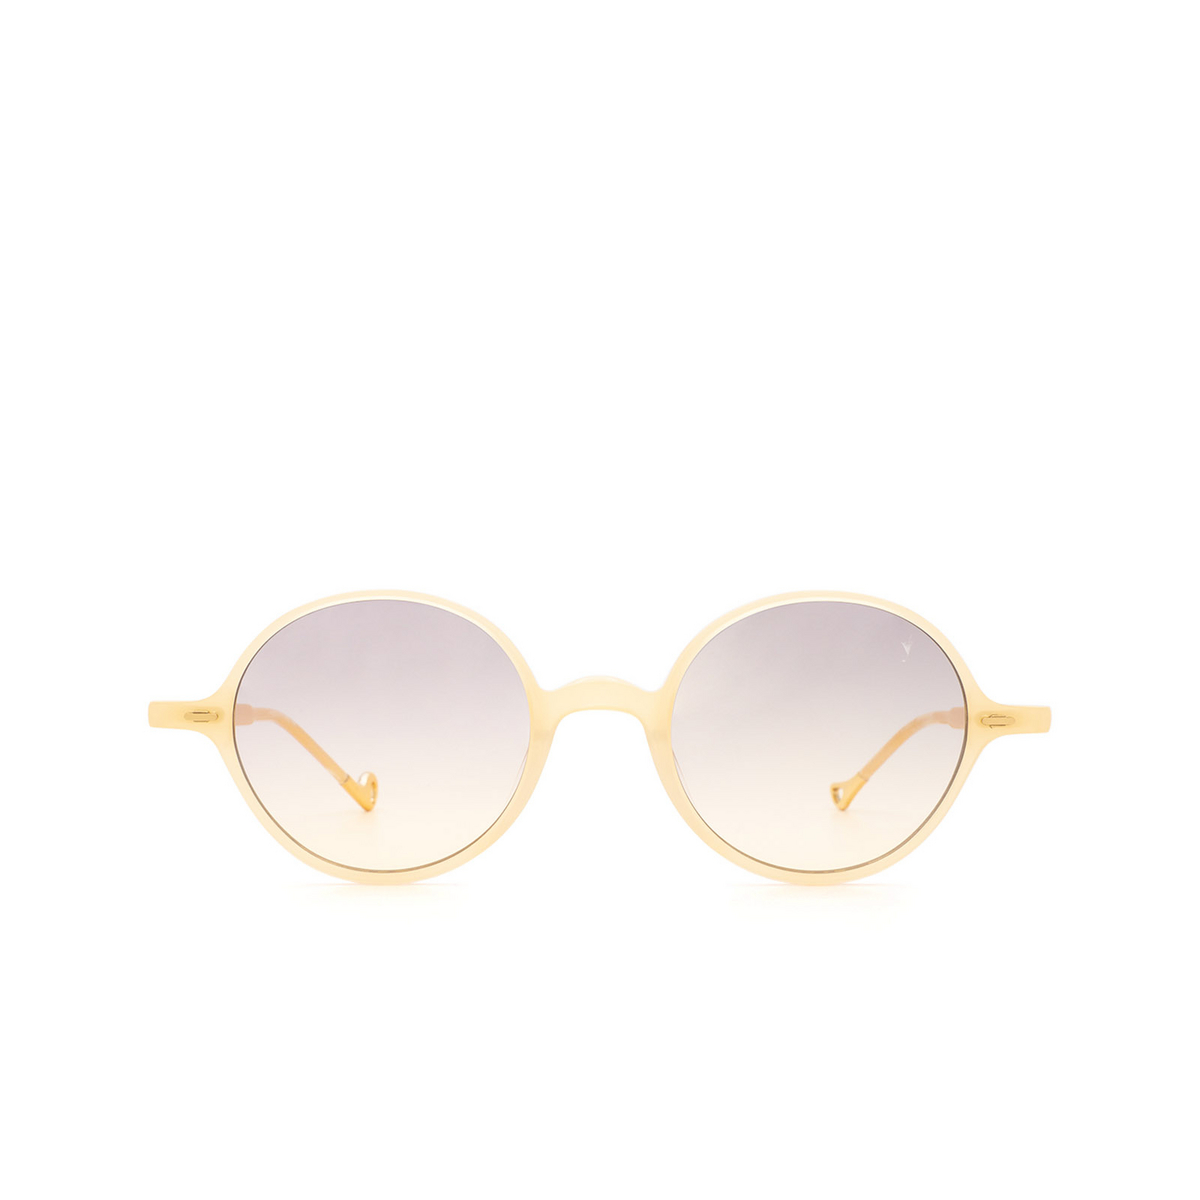 Eyepetizer® Round Sunglasses: Pallavicini color Honey C.C/C-19 - front view.